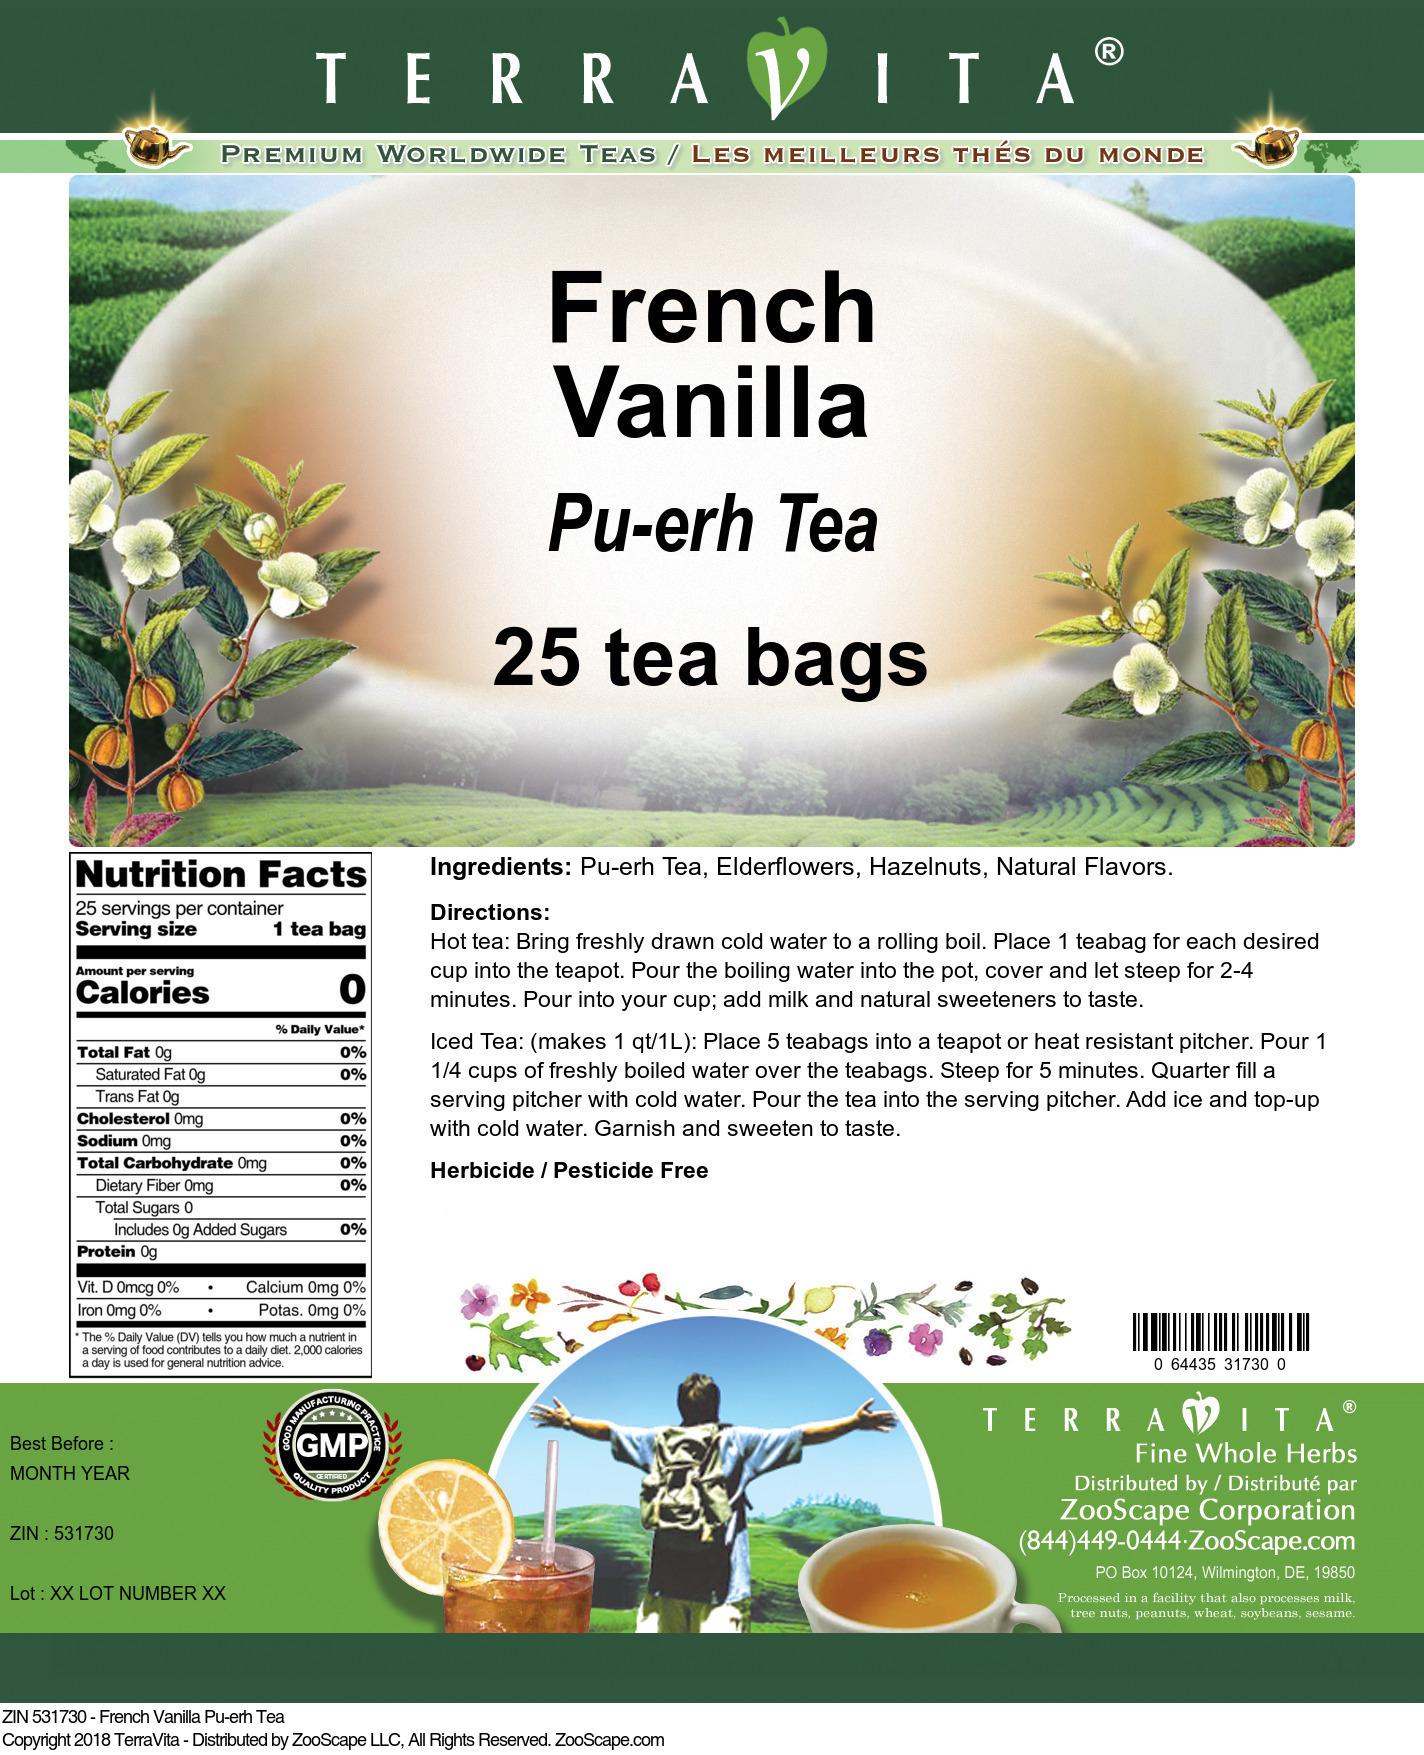 French Vanilla Pu-erh Tea